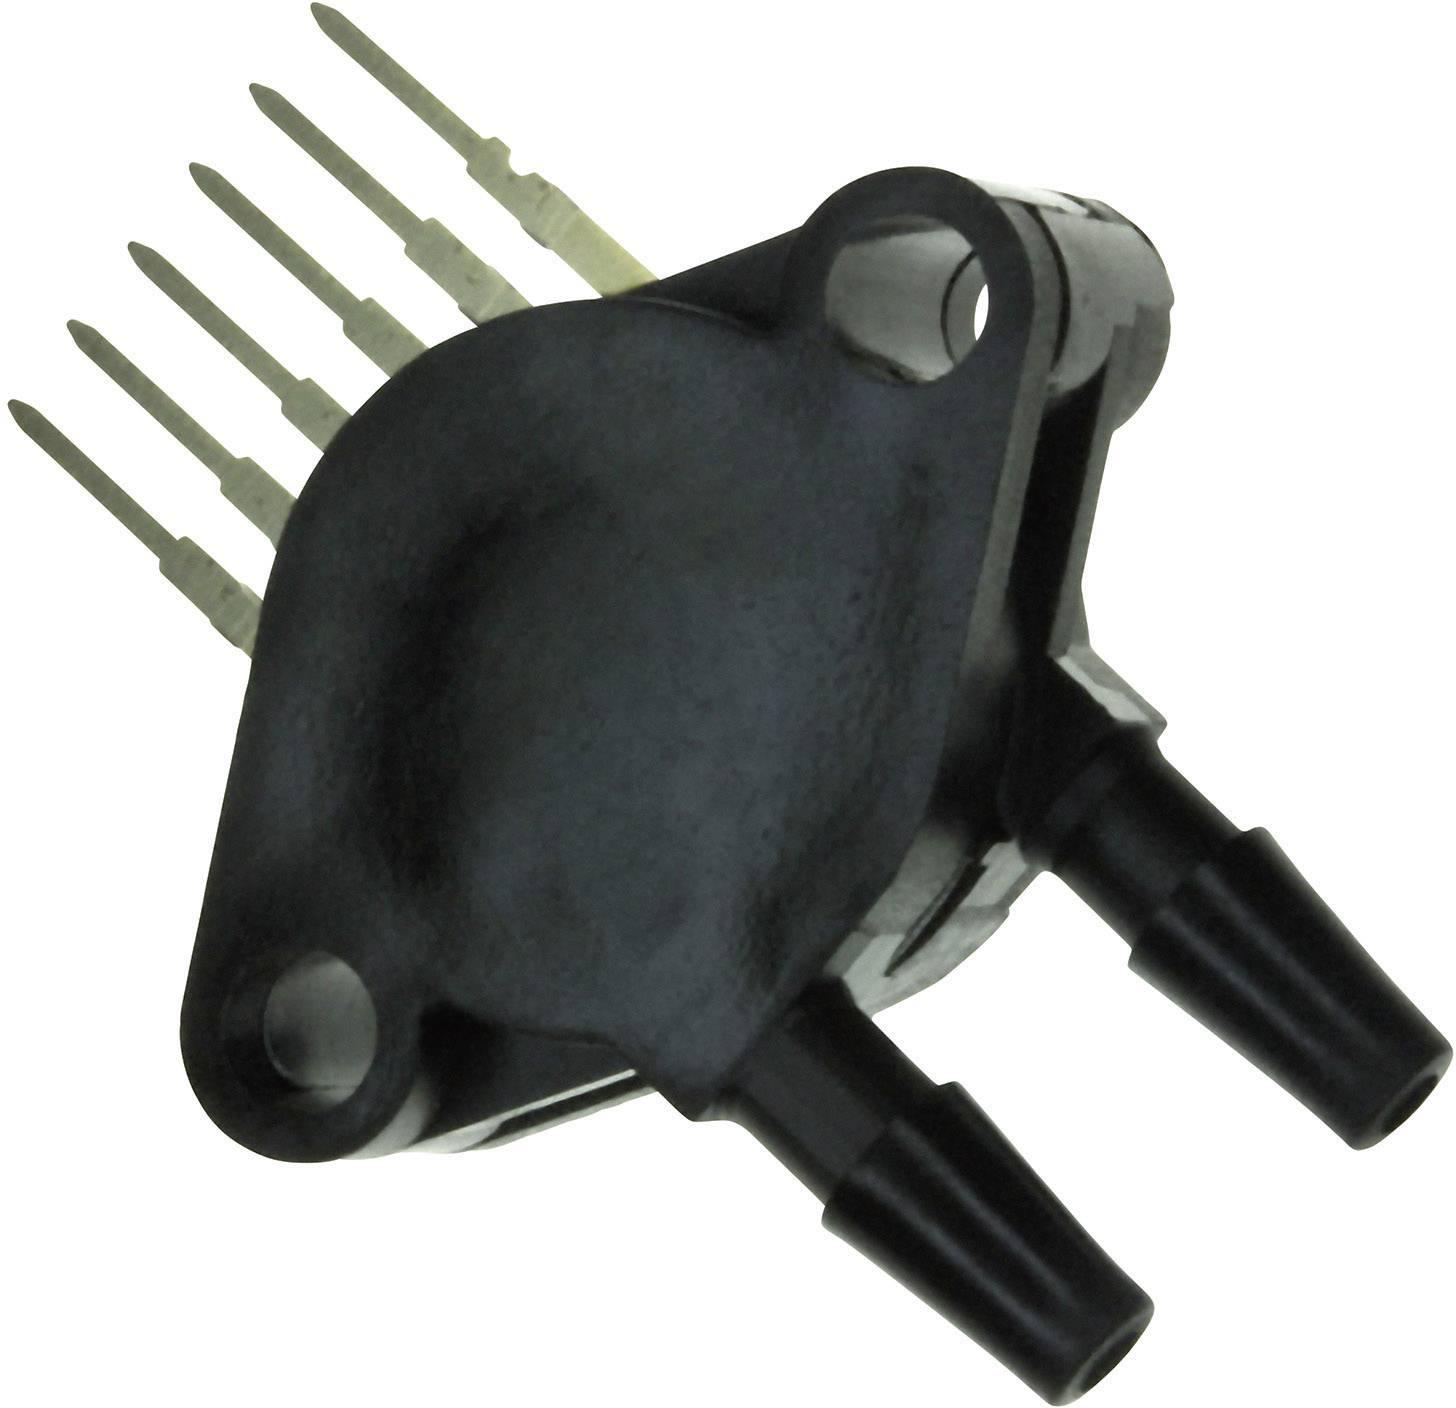 Senzor tlaku NXP Semiconductors MPX5010DP, 0 kPa do 10 kPa